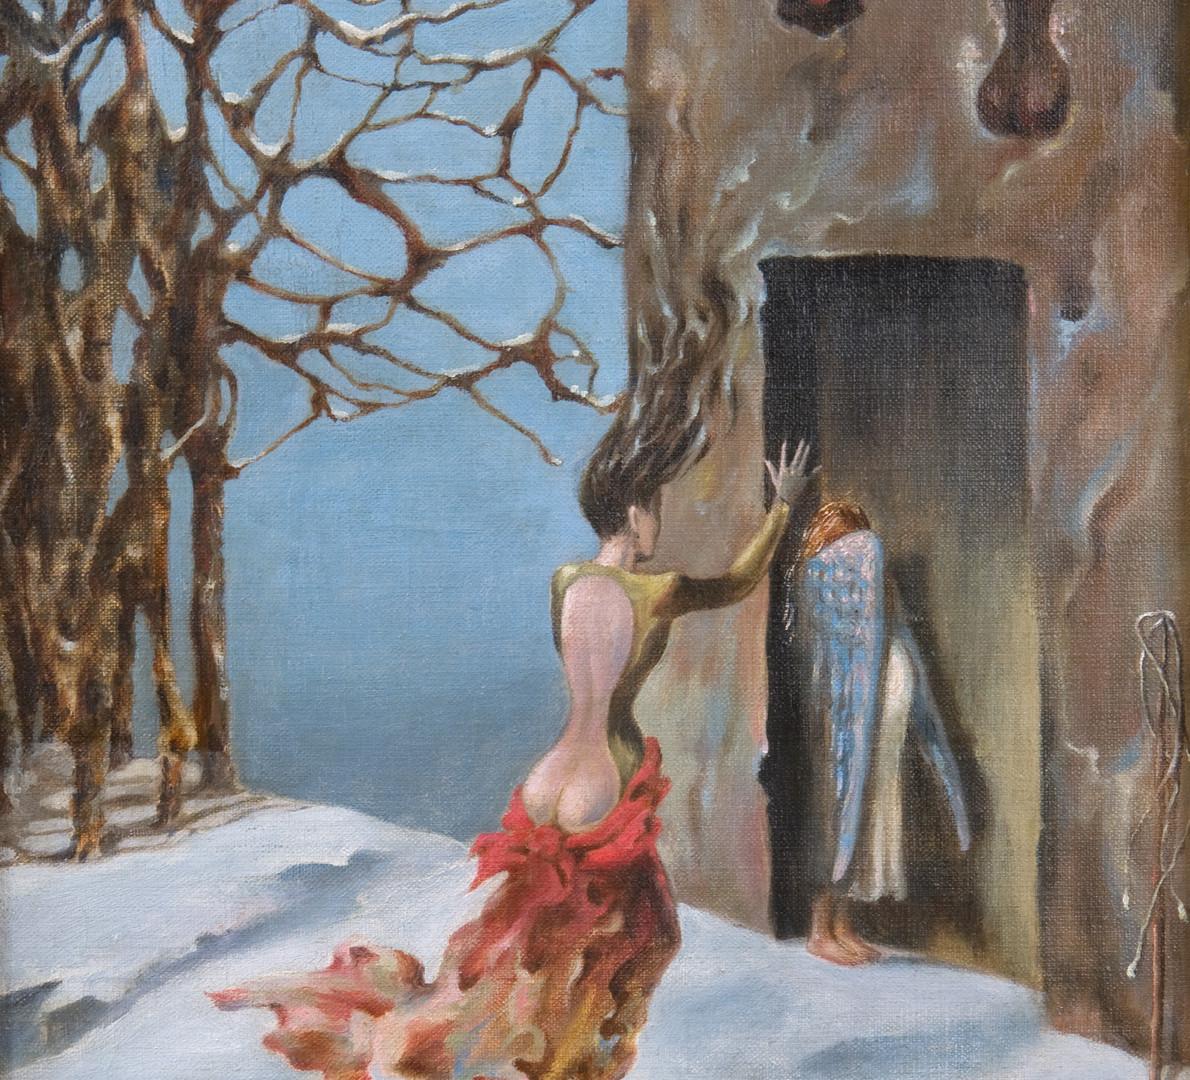 Dorothea Tanning (American, b. 1910), Moeurs Espagnoles, 1943